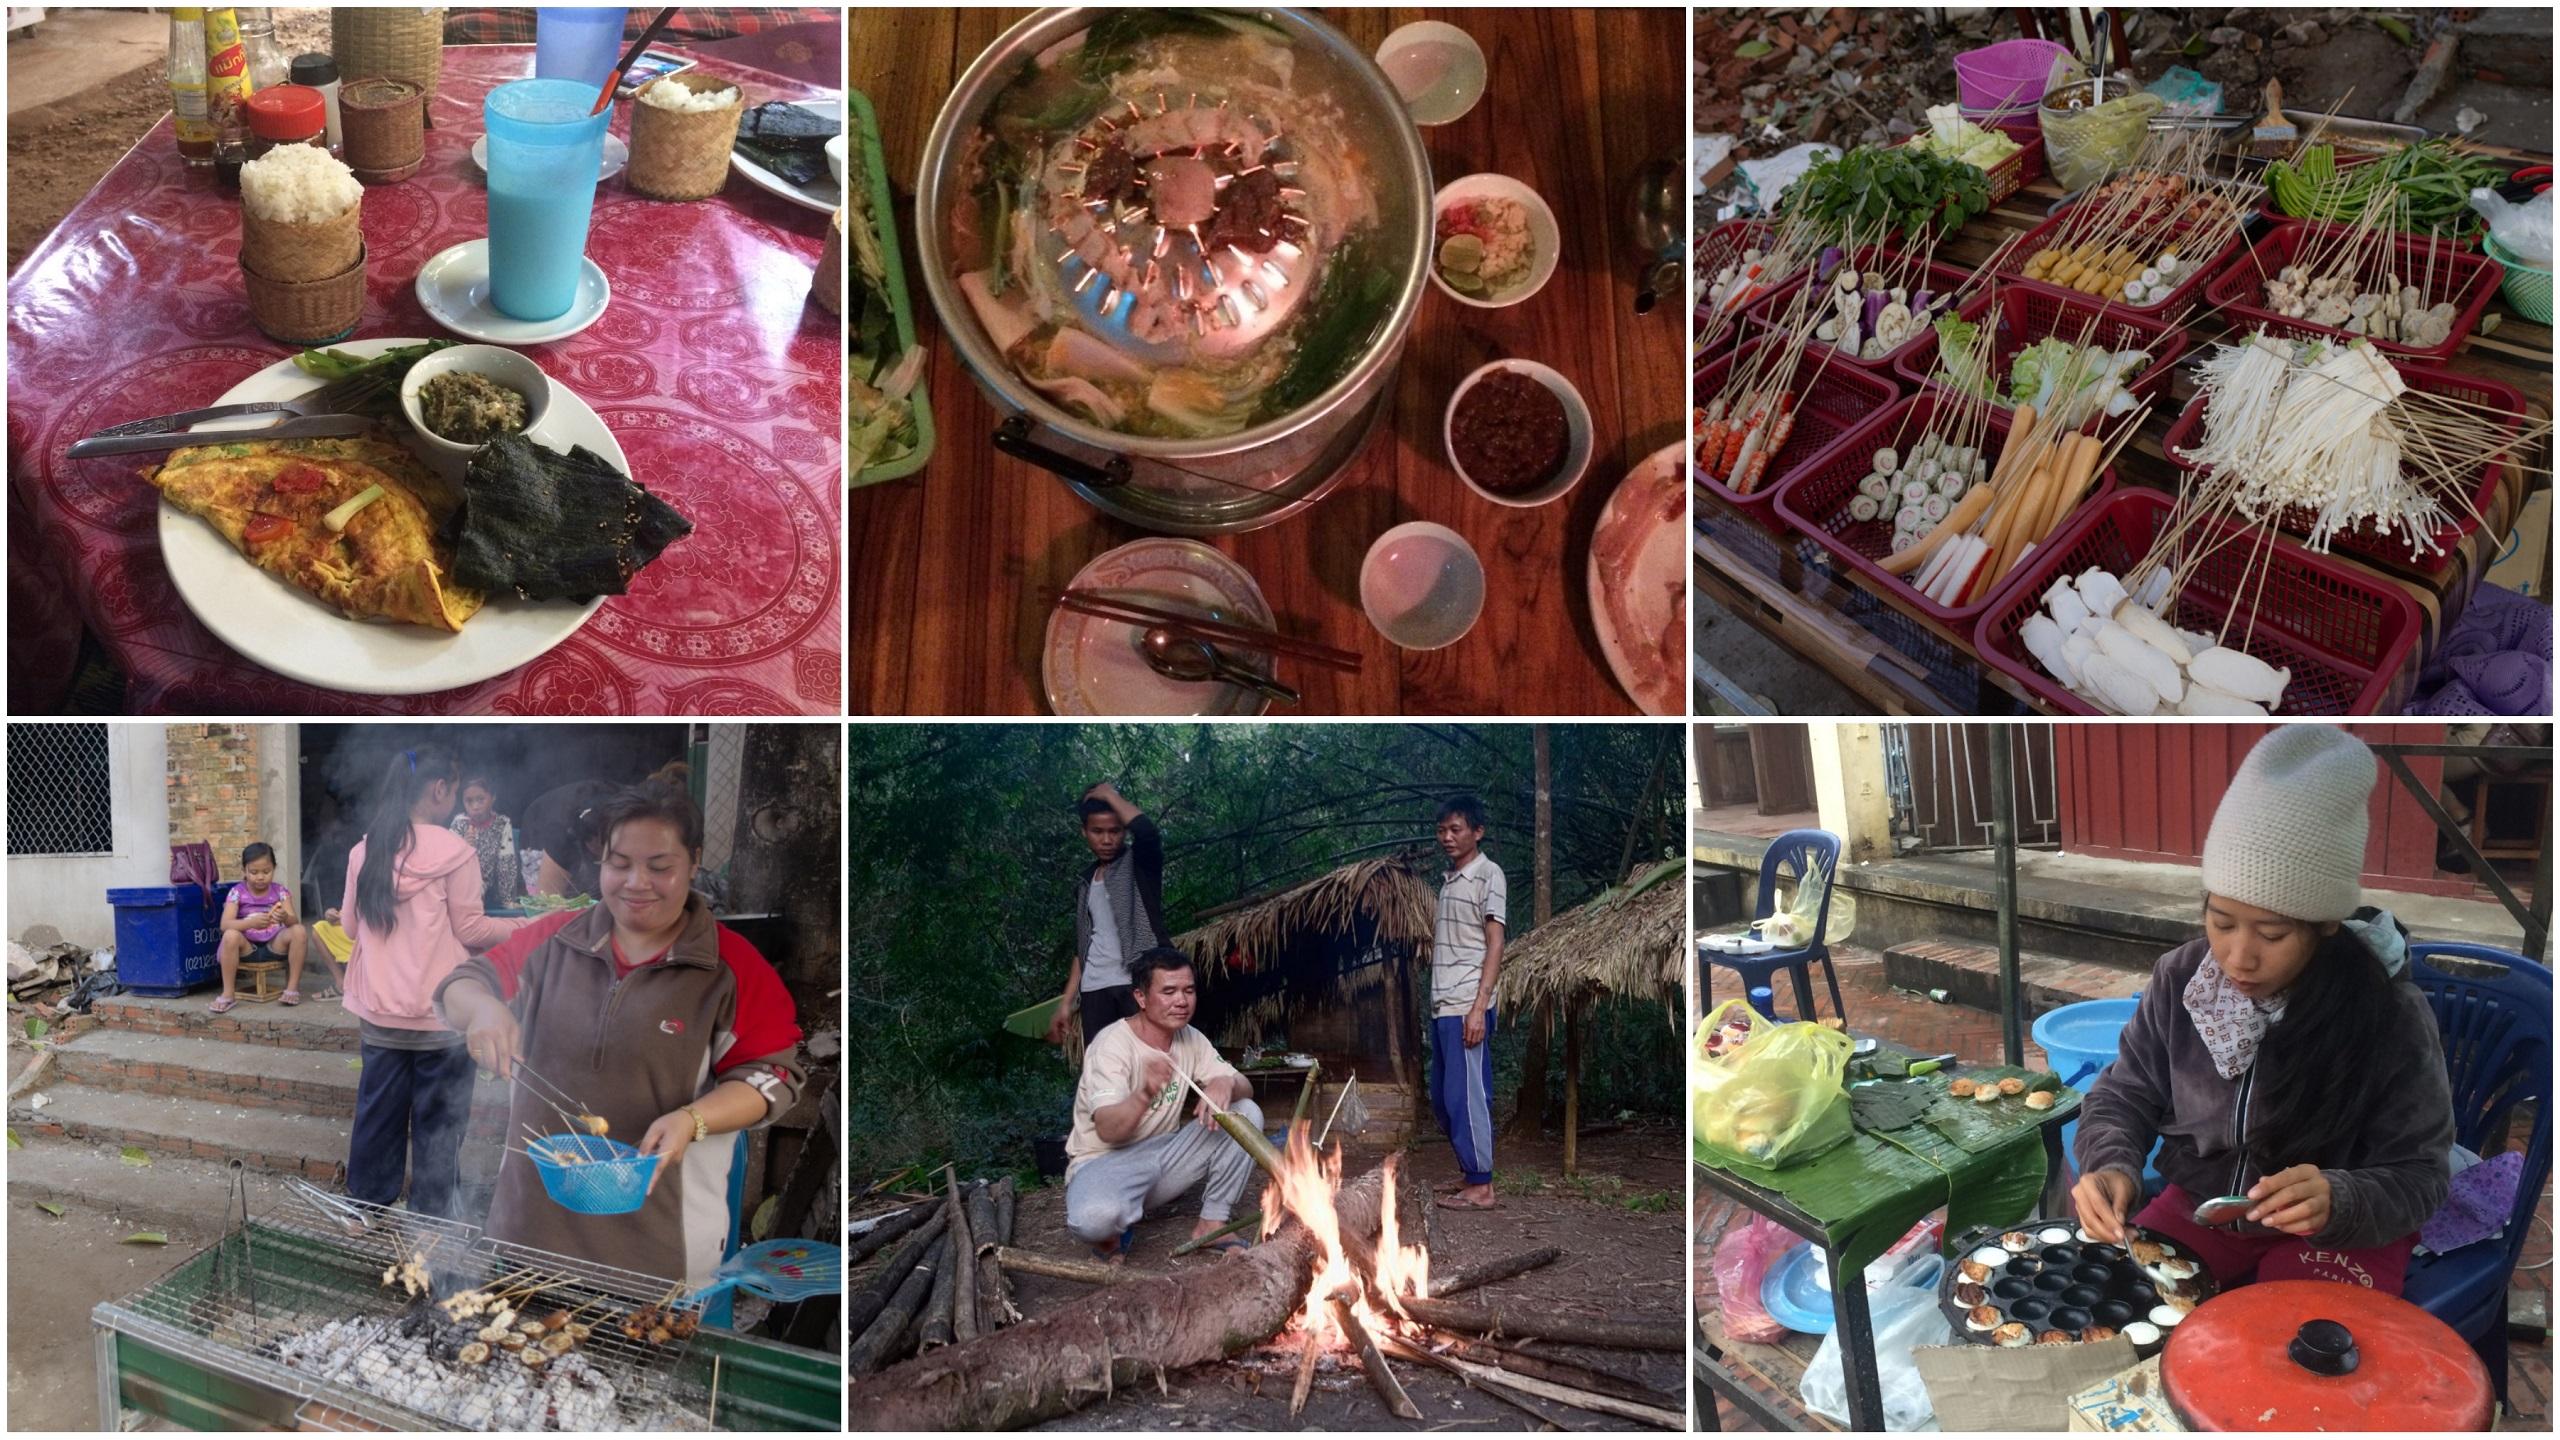 Kuchnia Laosu - kuchnie świata. Autorka: Maria Magdalena Krychowska